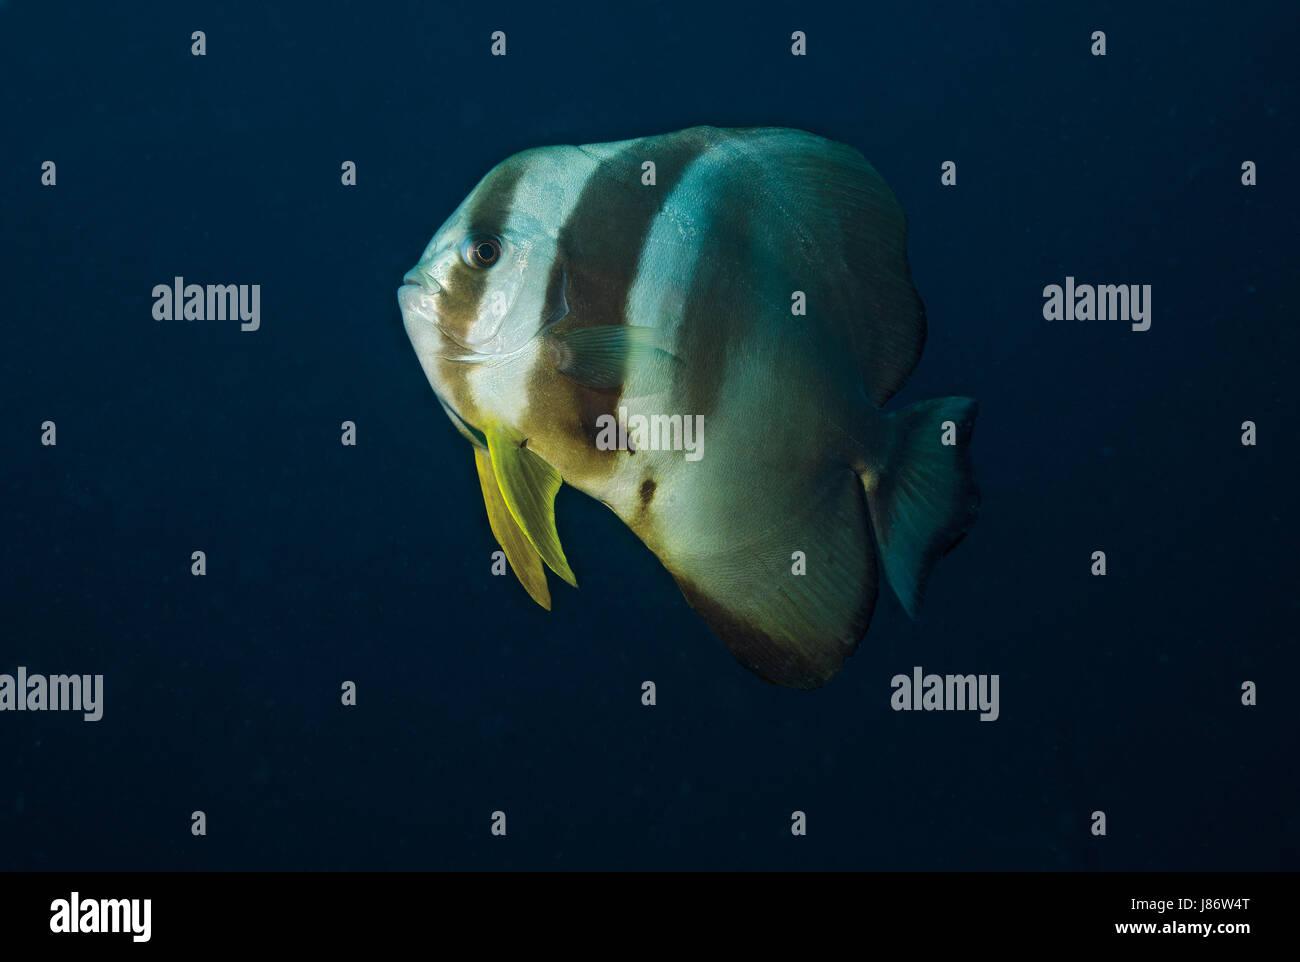 Side view of a Longfin Batfish, Platax teira, Ari Atoll, Indian Ocean, Maldives - Stock Image